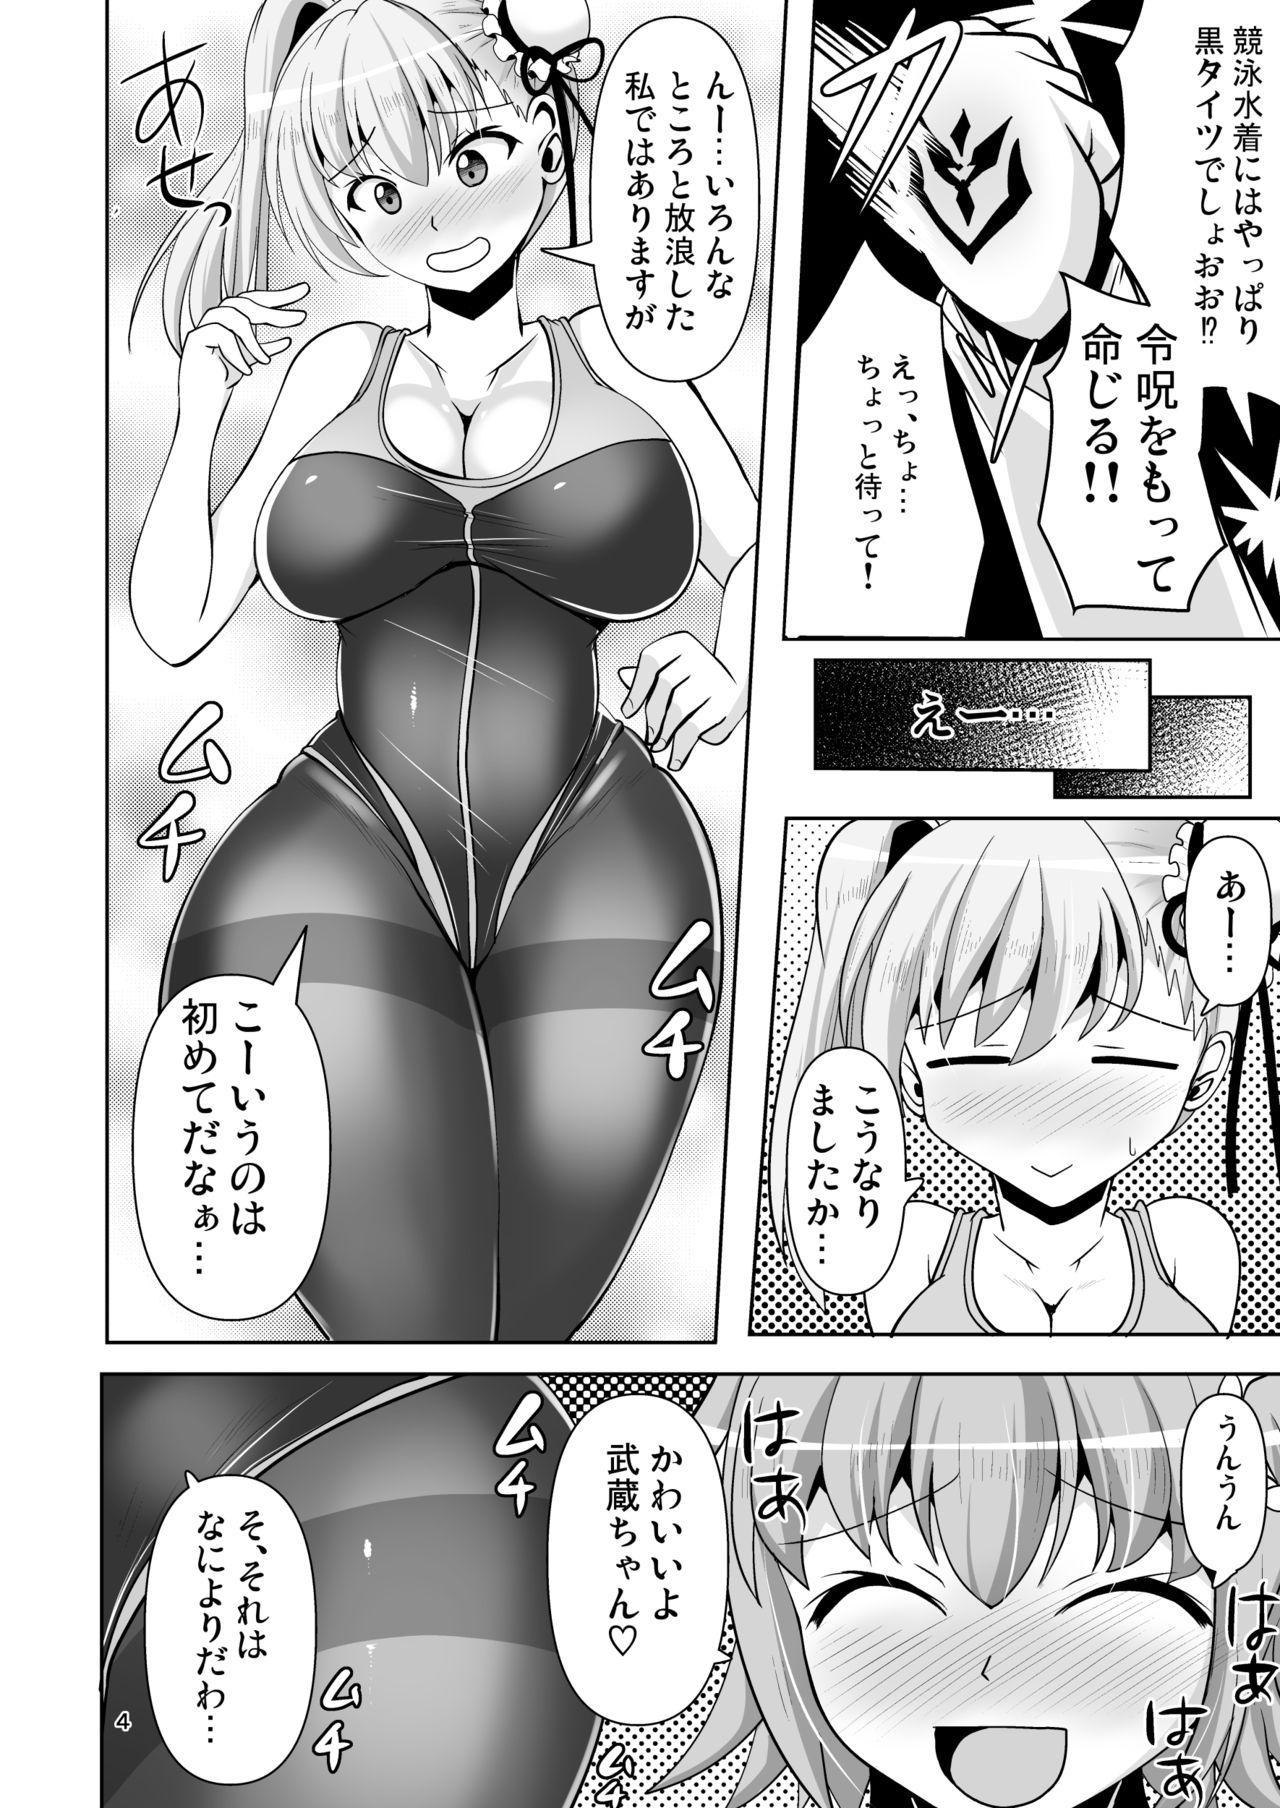 Chaldea Kuro Tights Bu 4 3